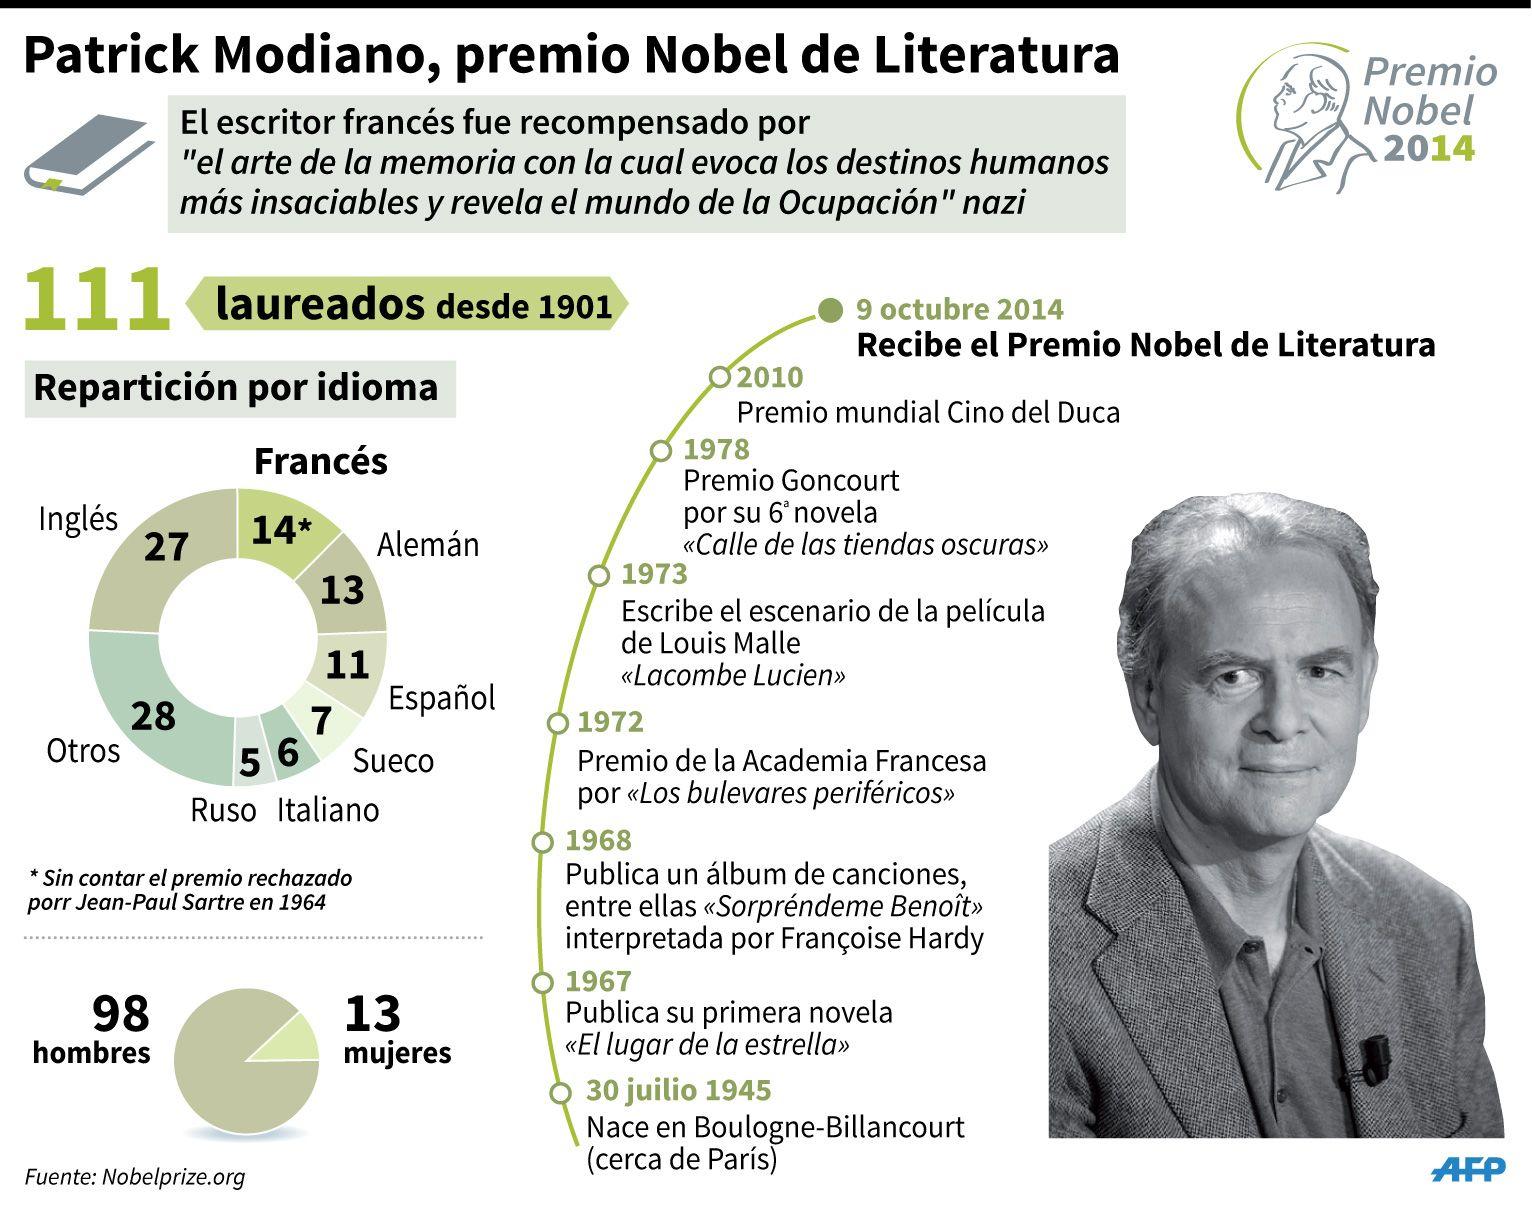 Patrick Mondiano, Premio Nobel de literatura 2014